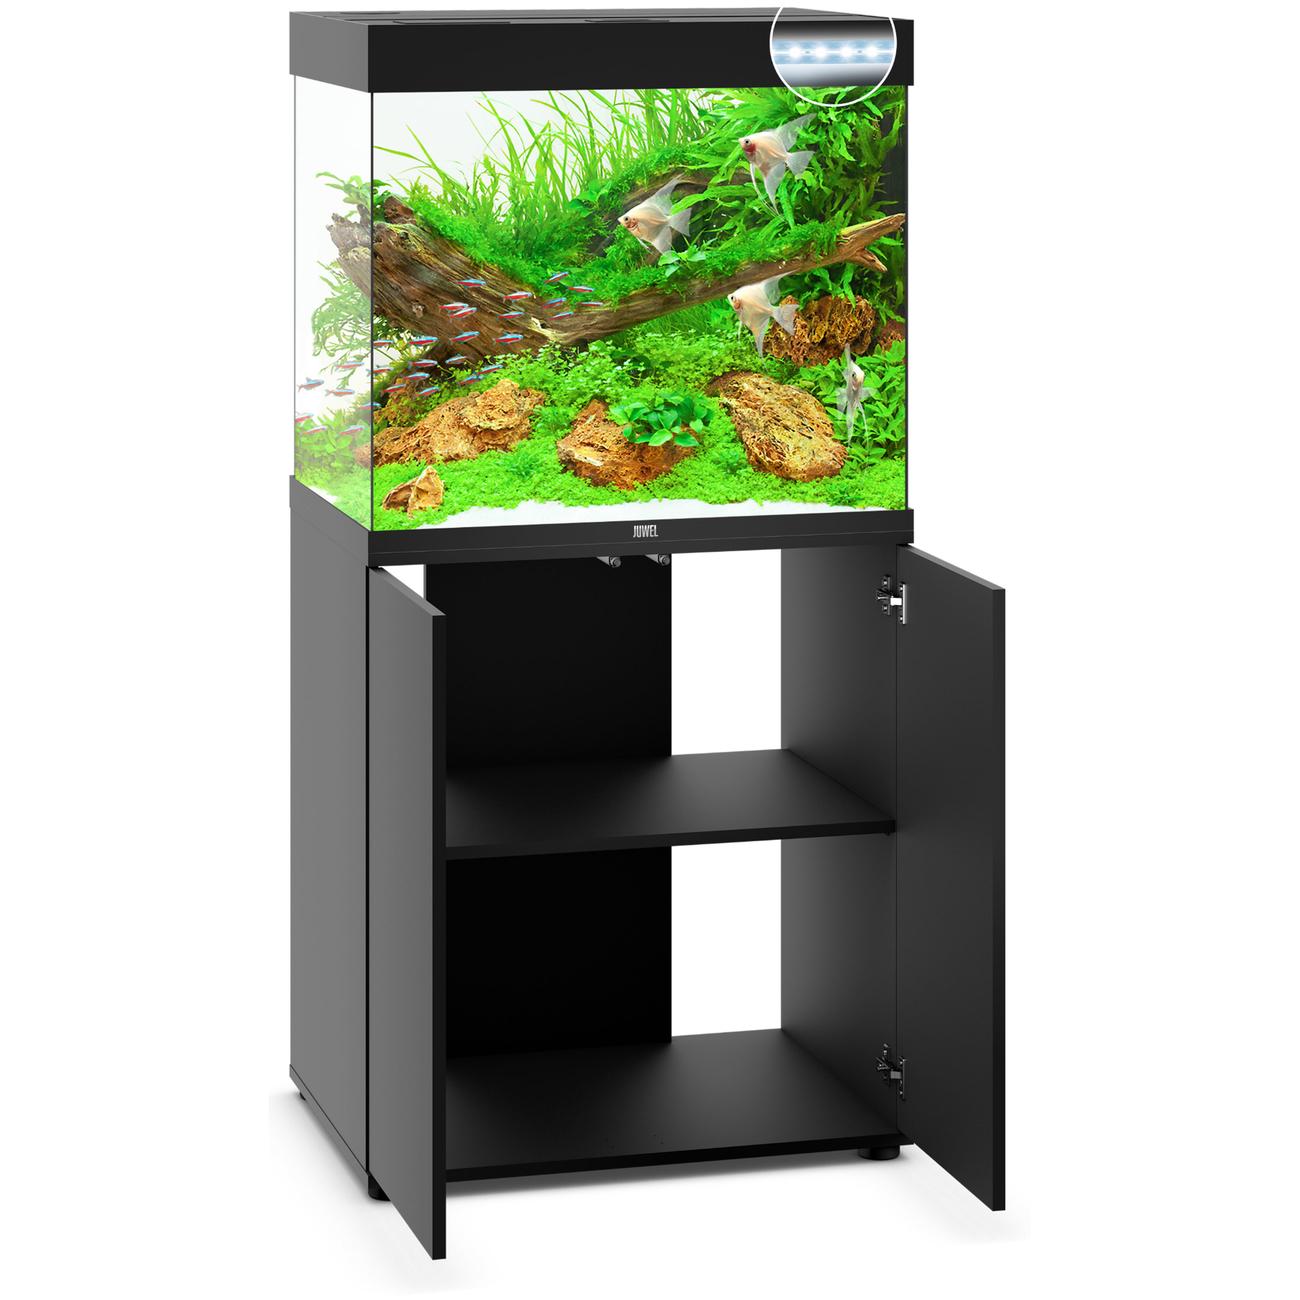 Juwel Lido 200 LED Aquarium mit Unterschrank, Bild 4